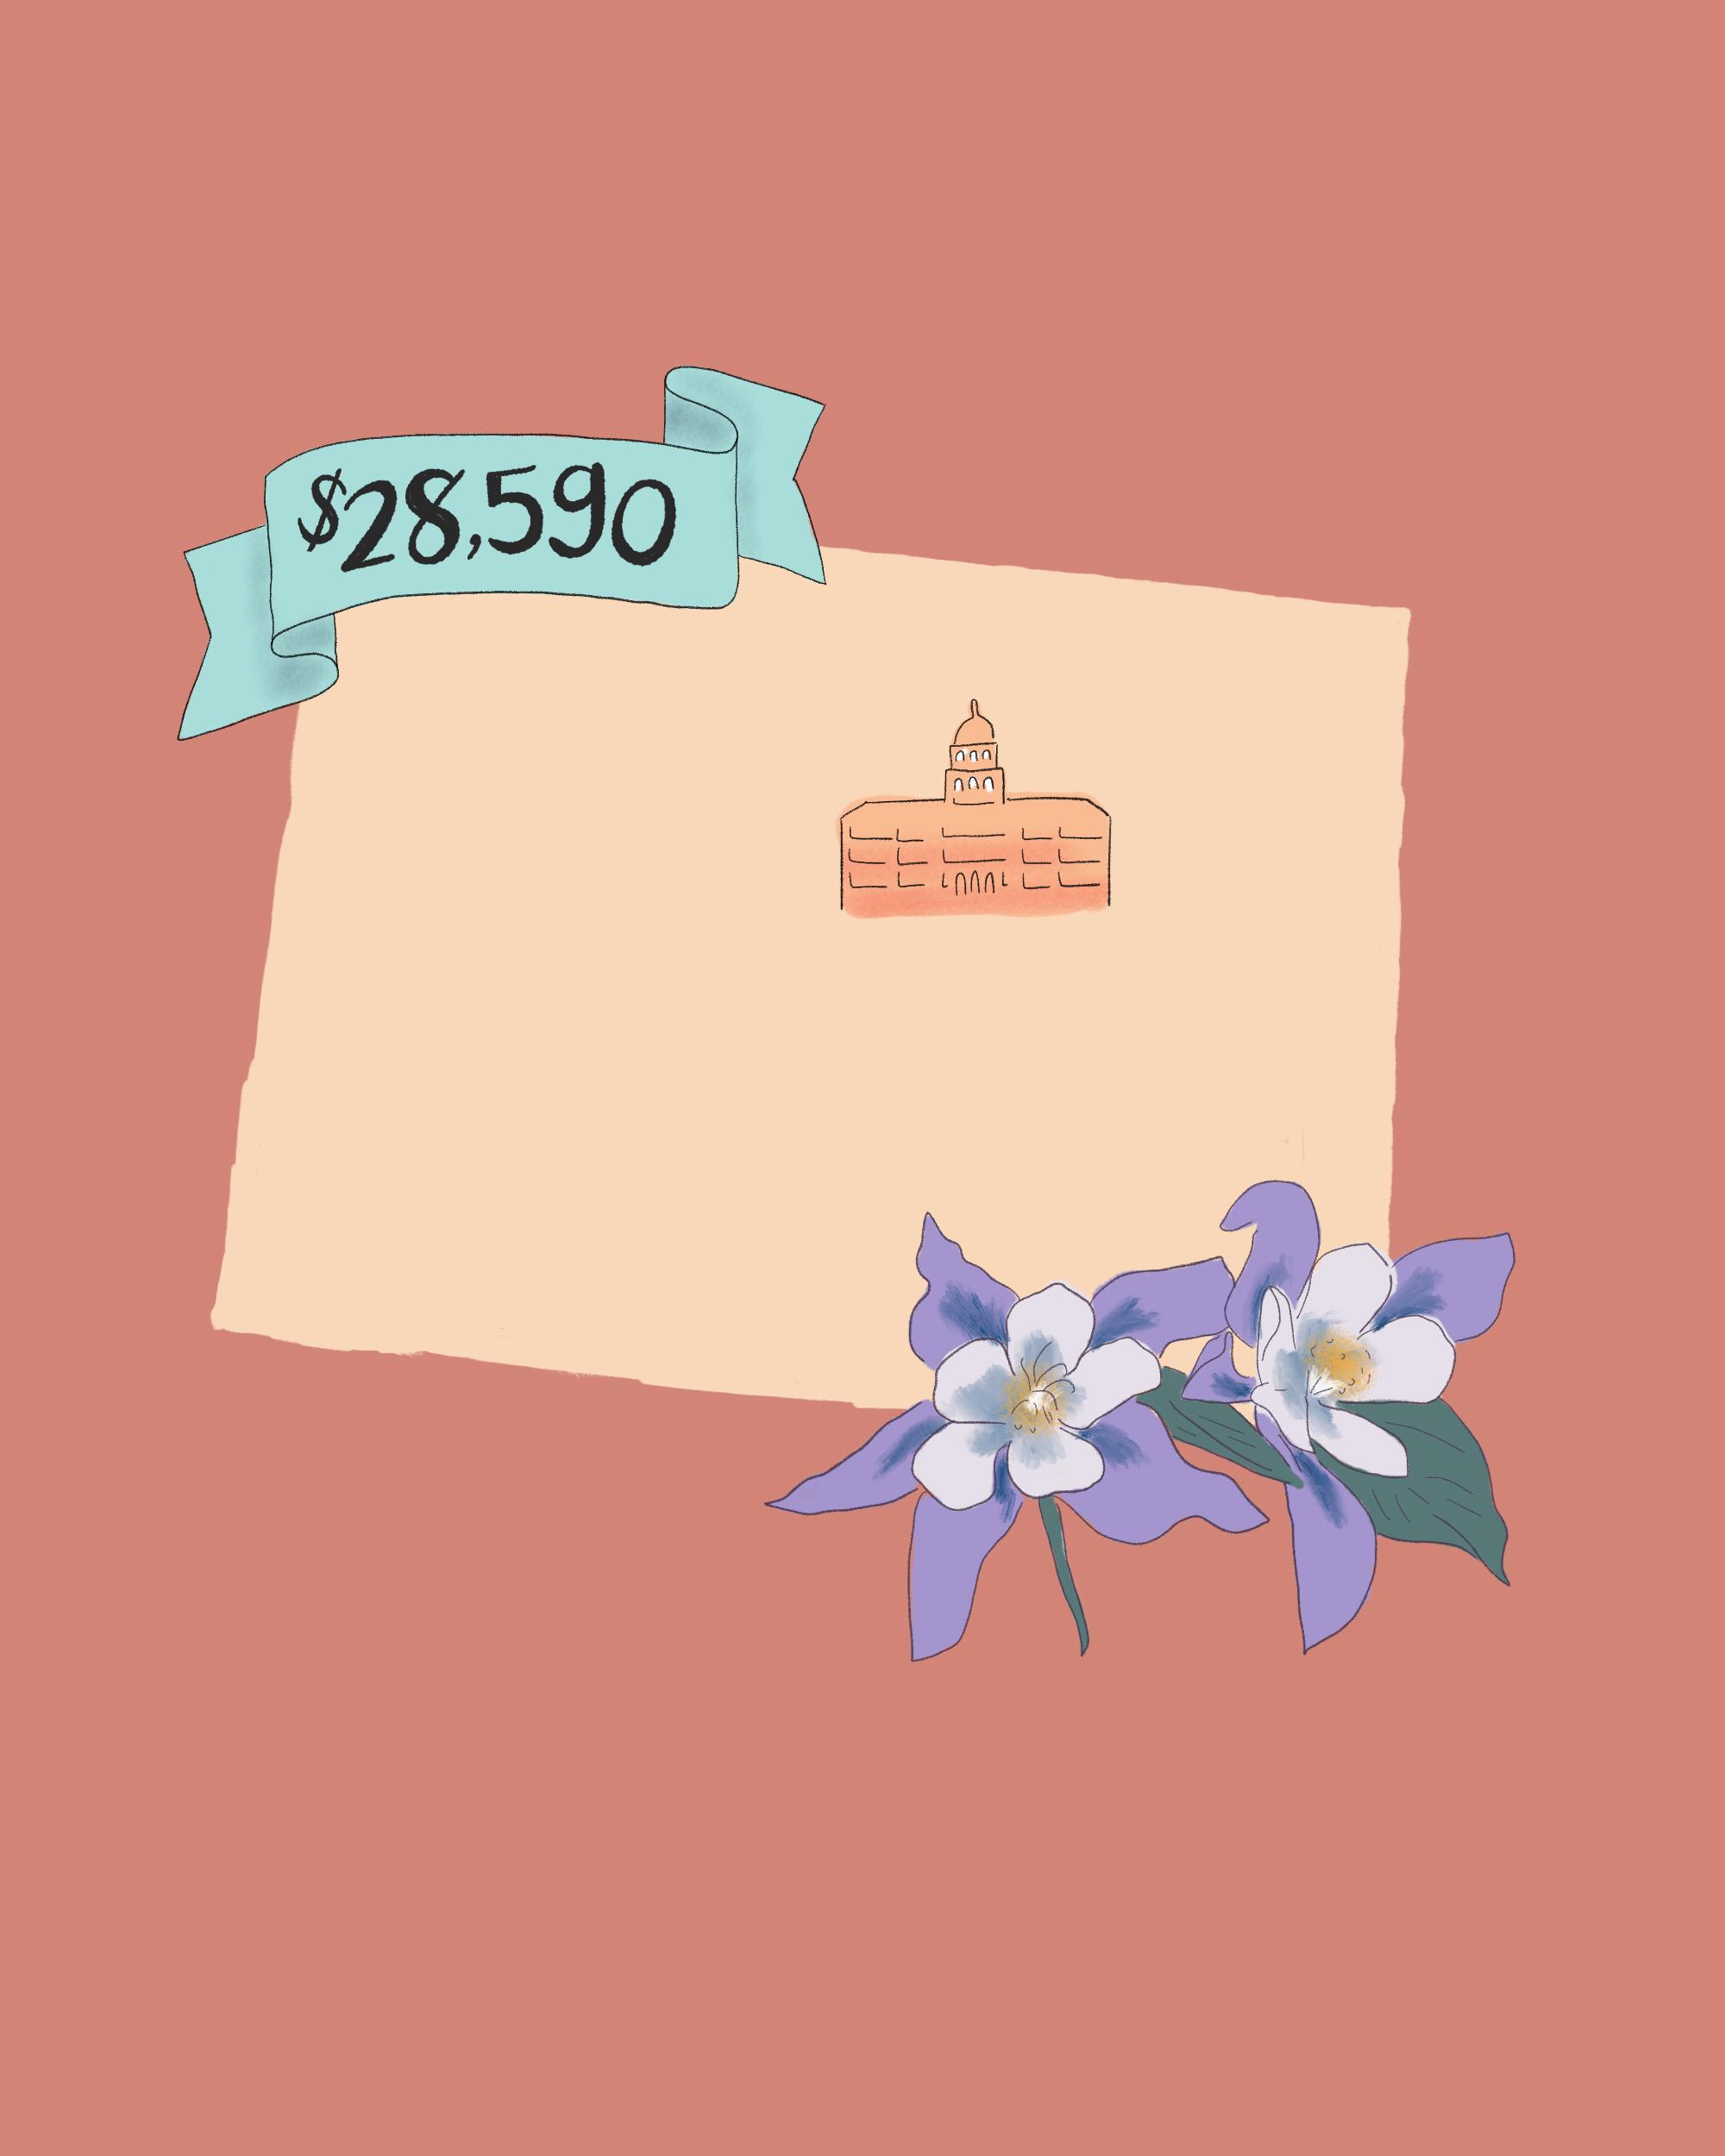 state wedding costs illustration colorado